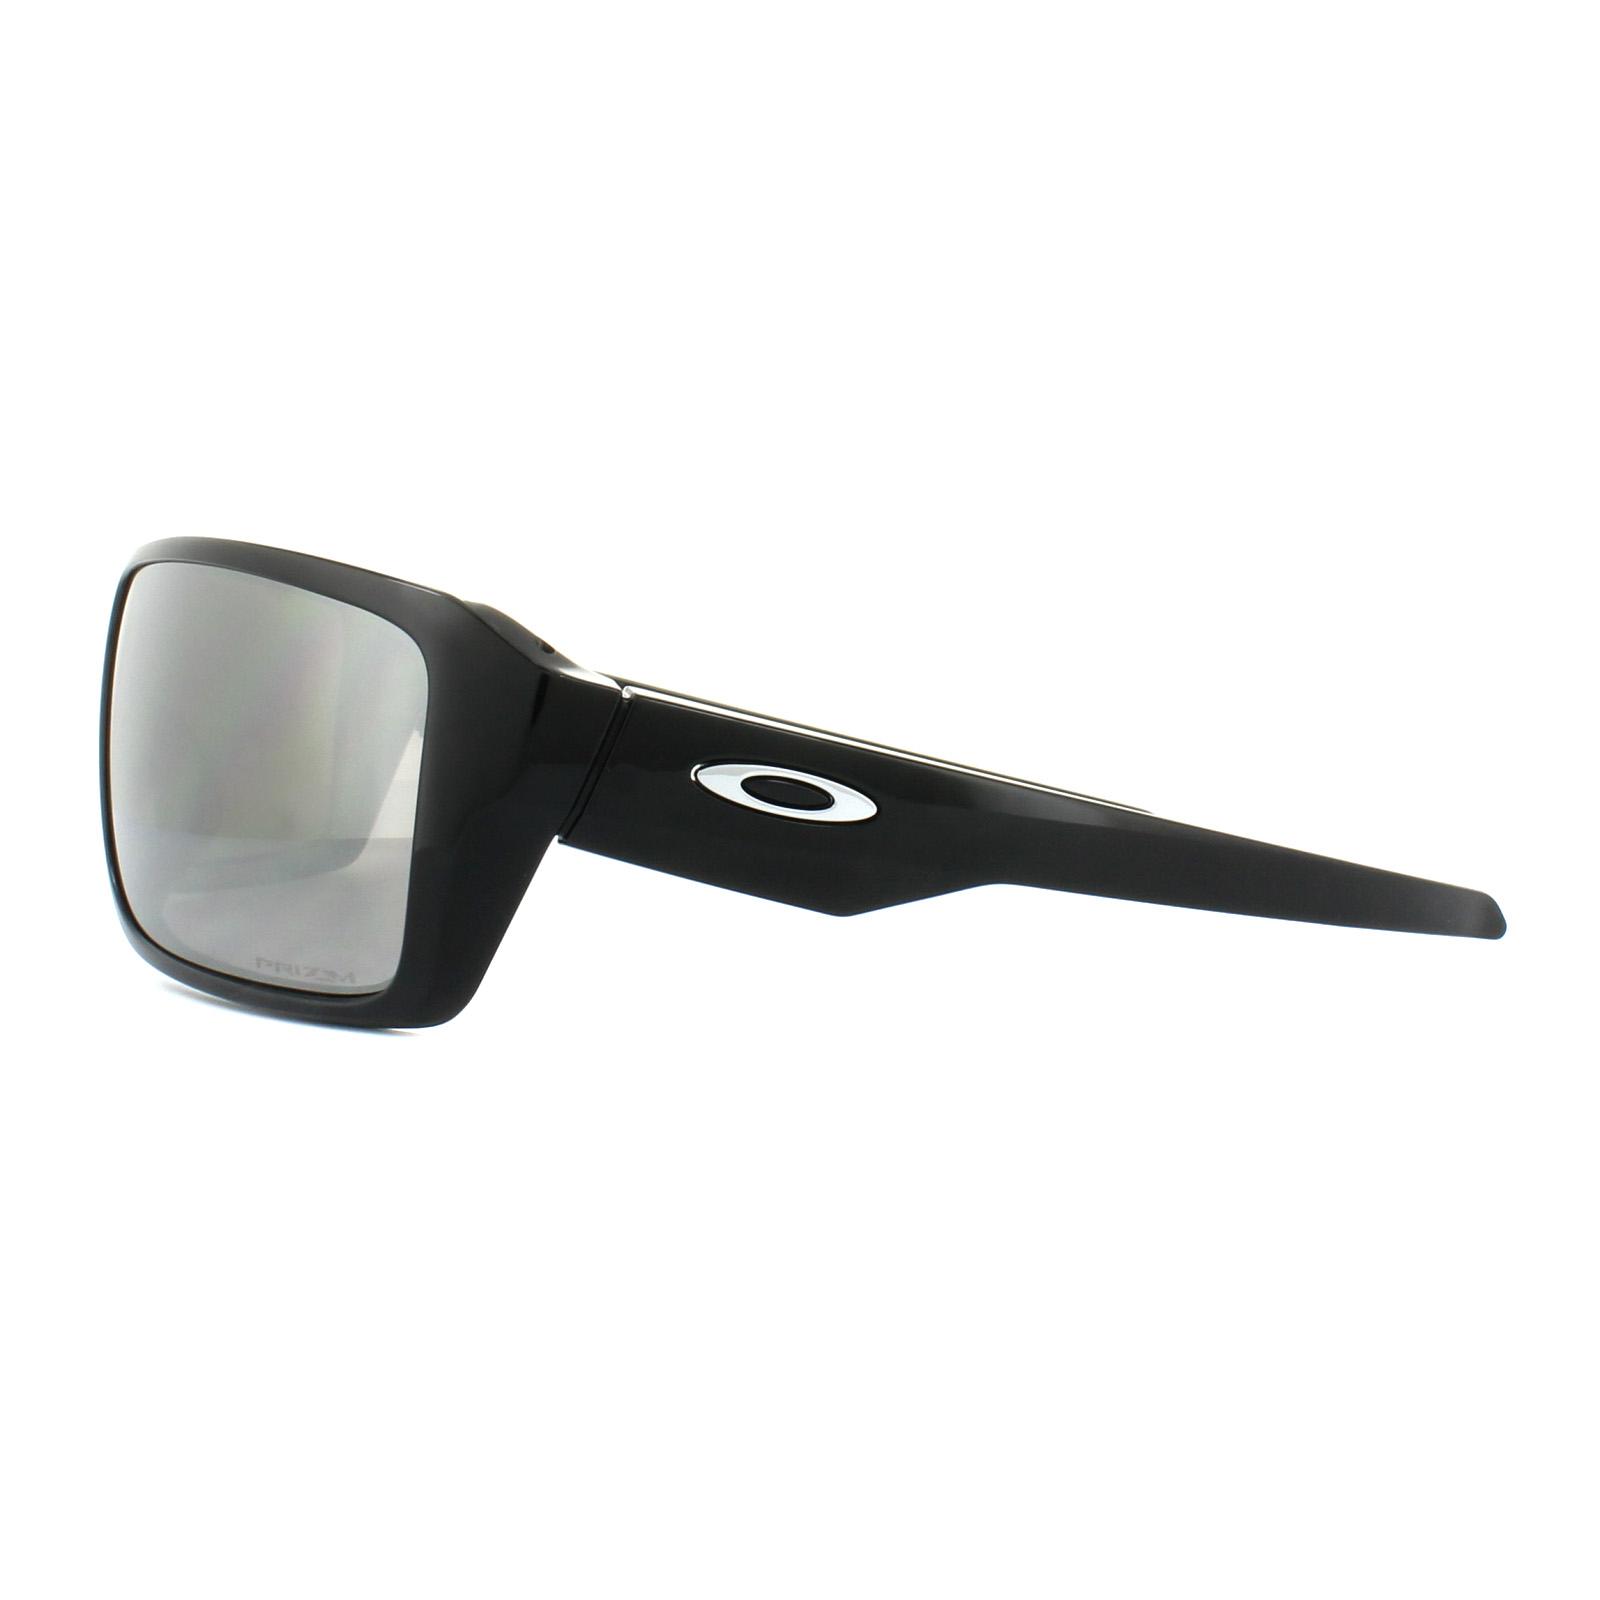 b74229f551 Sentinel Oakley Sunglasses Double Edge OO9380-08 Polished Black Prizm Black  Polarized